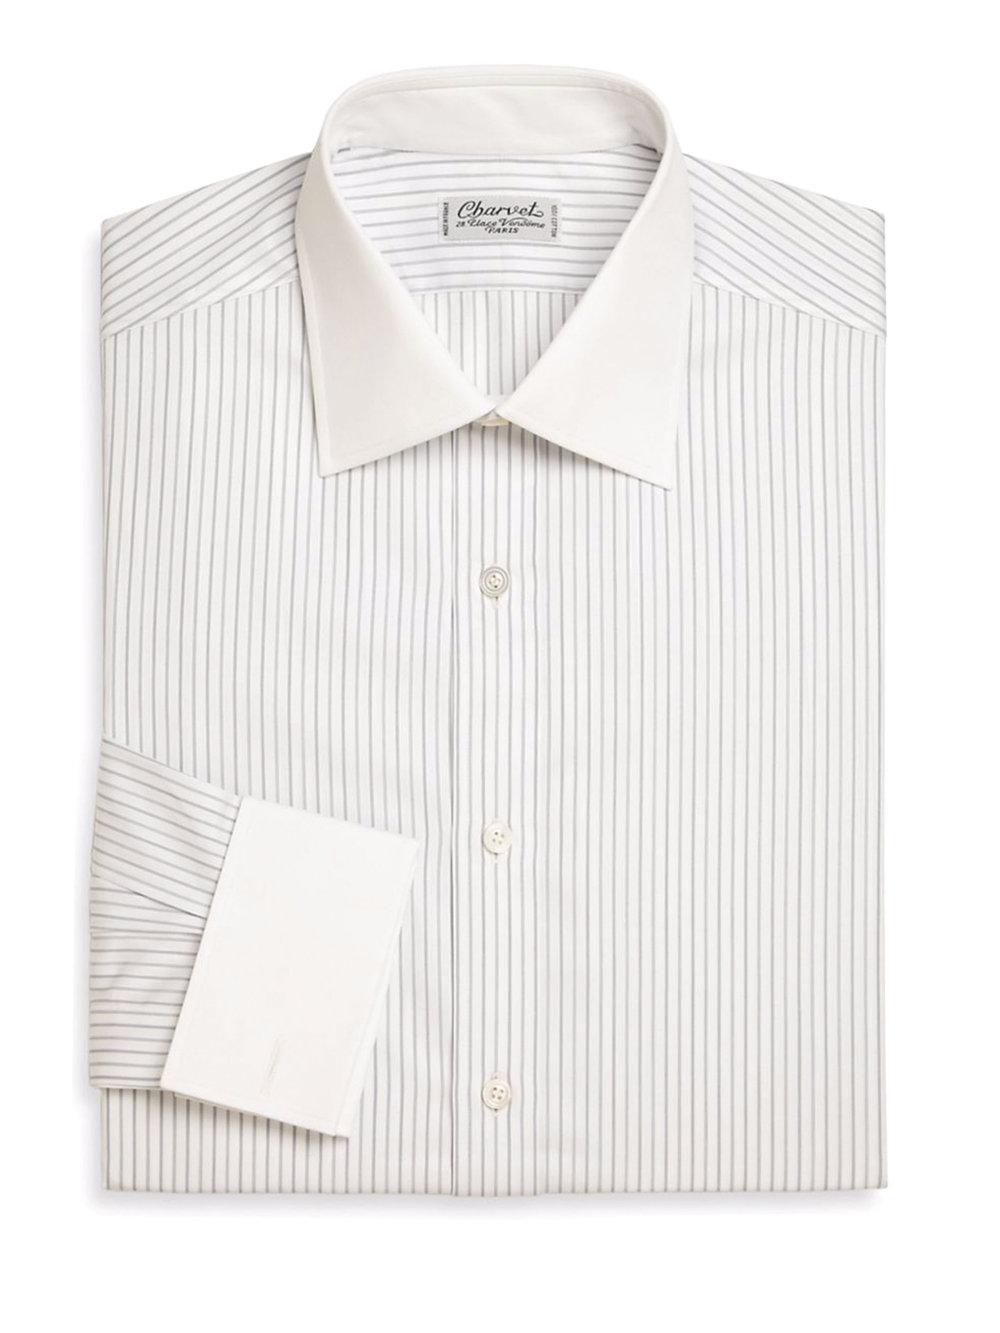 7.Charvet 襯衫 $865,  saksfifthavenue.com